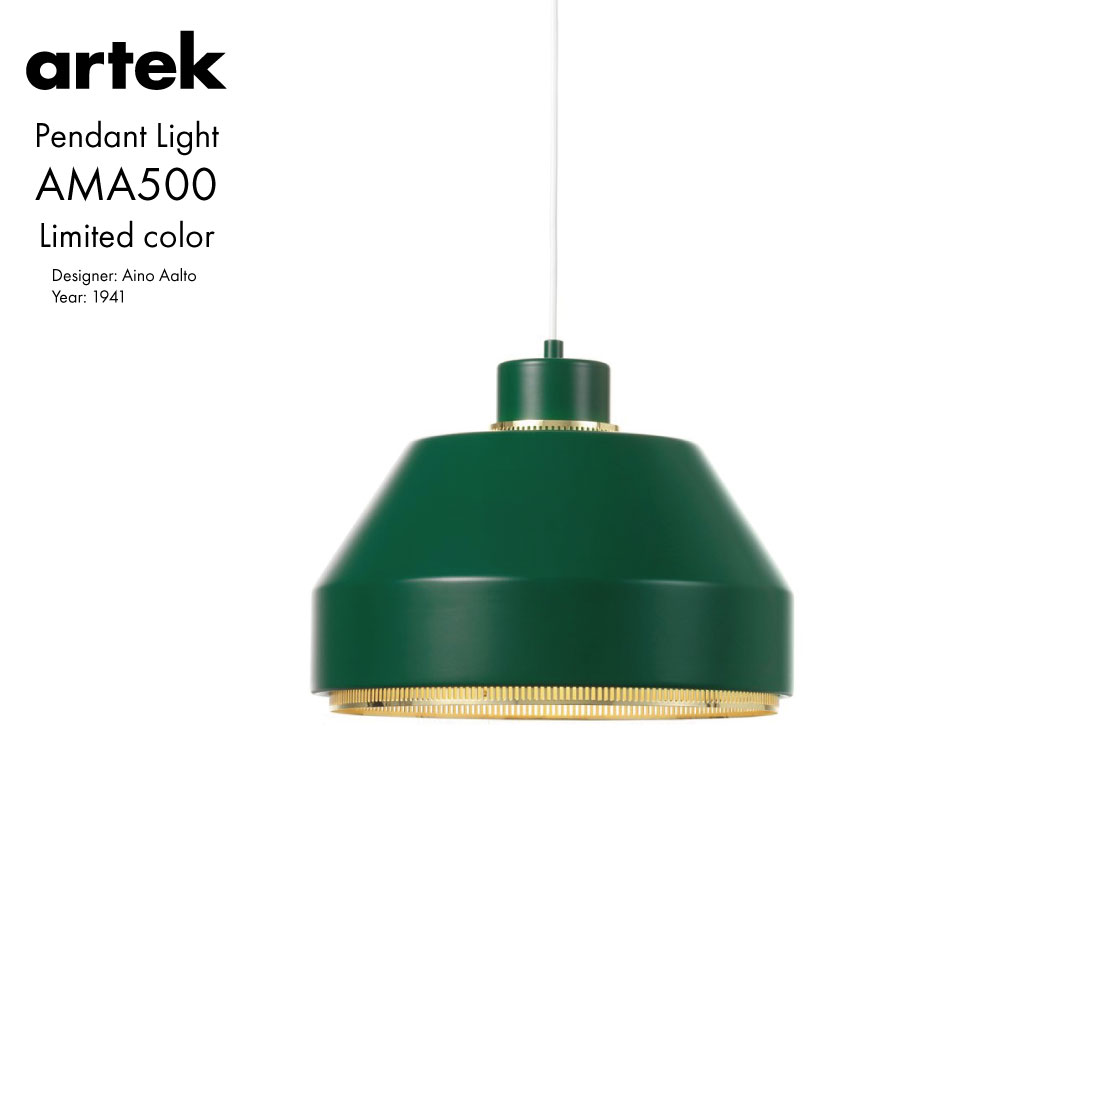 【artek/アルテック】Pendant Light AMA500 限定色Aino Aalto/アイノ・アアルト/北欧/ペンダントランプ/照明/ライティング/